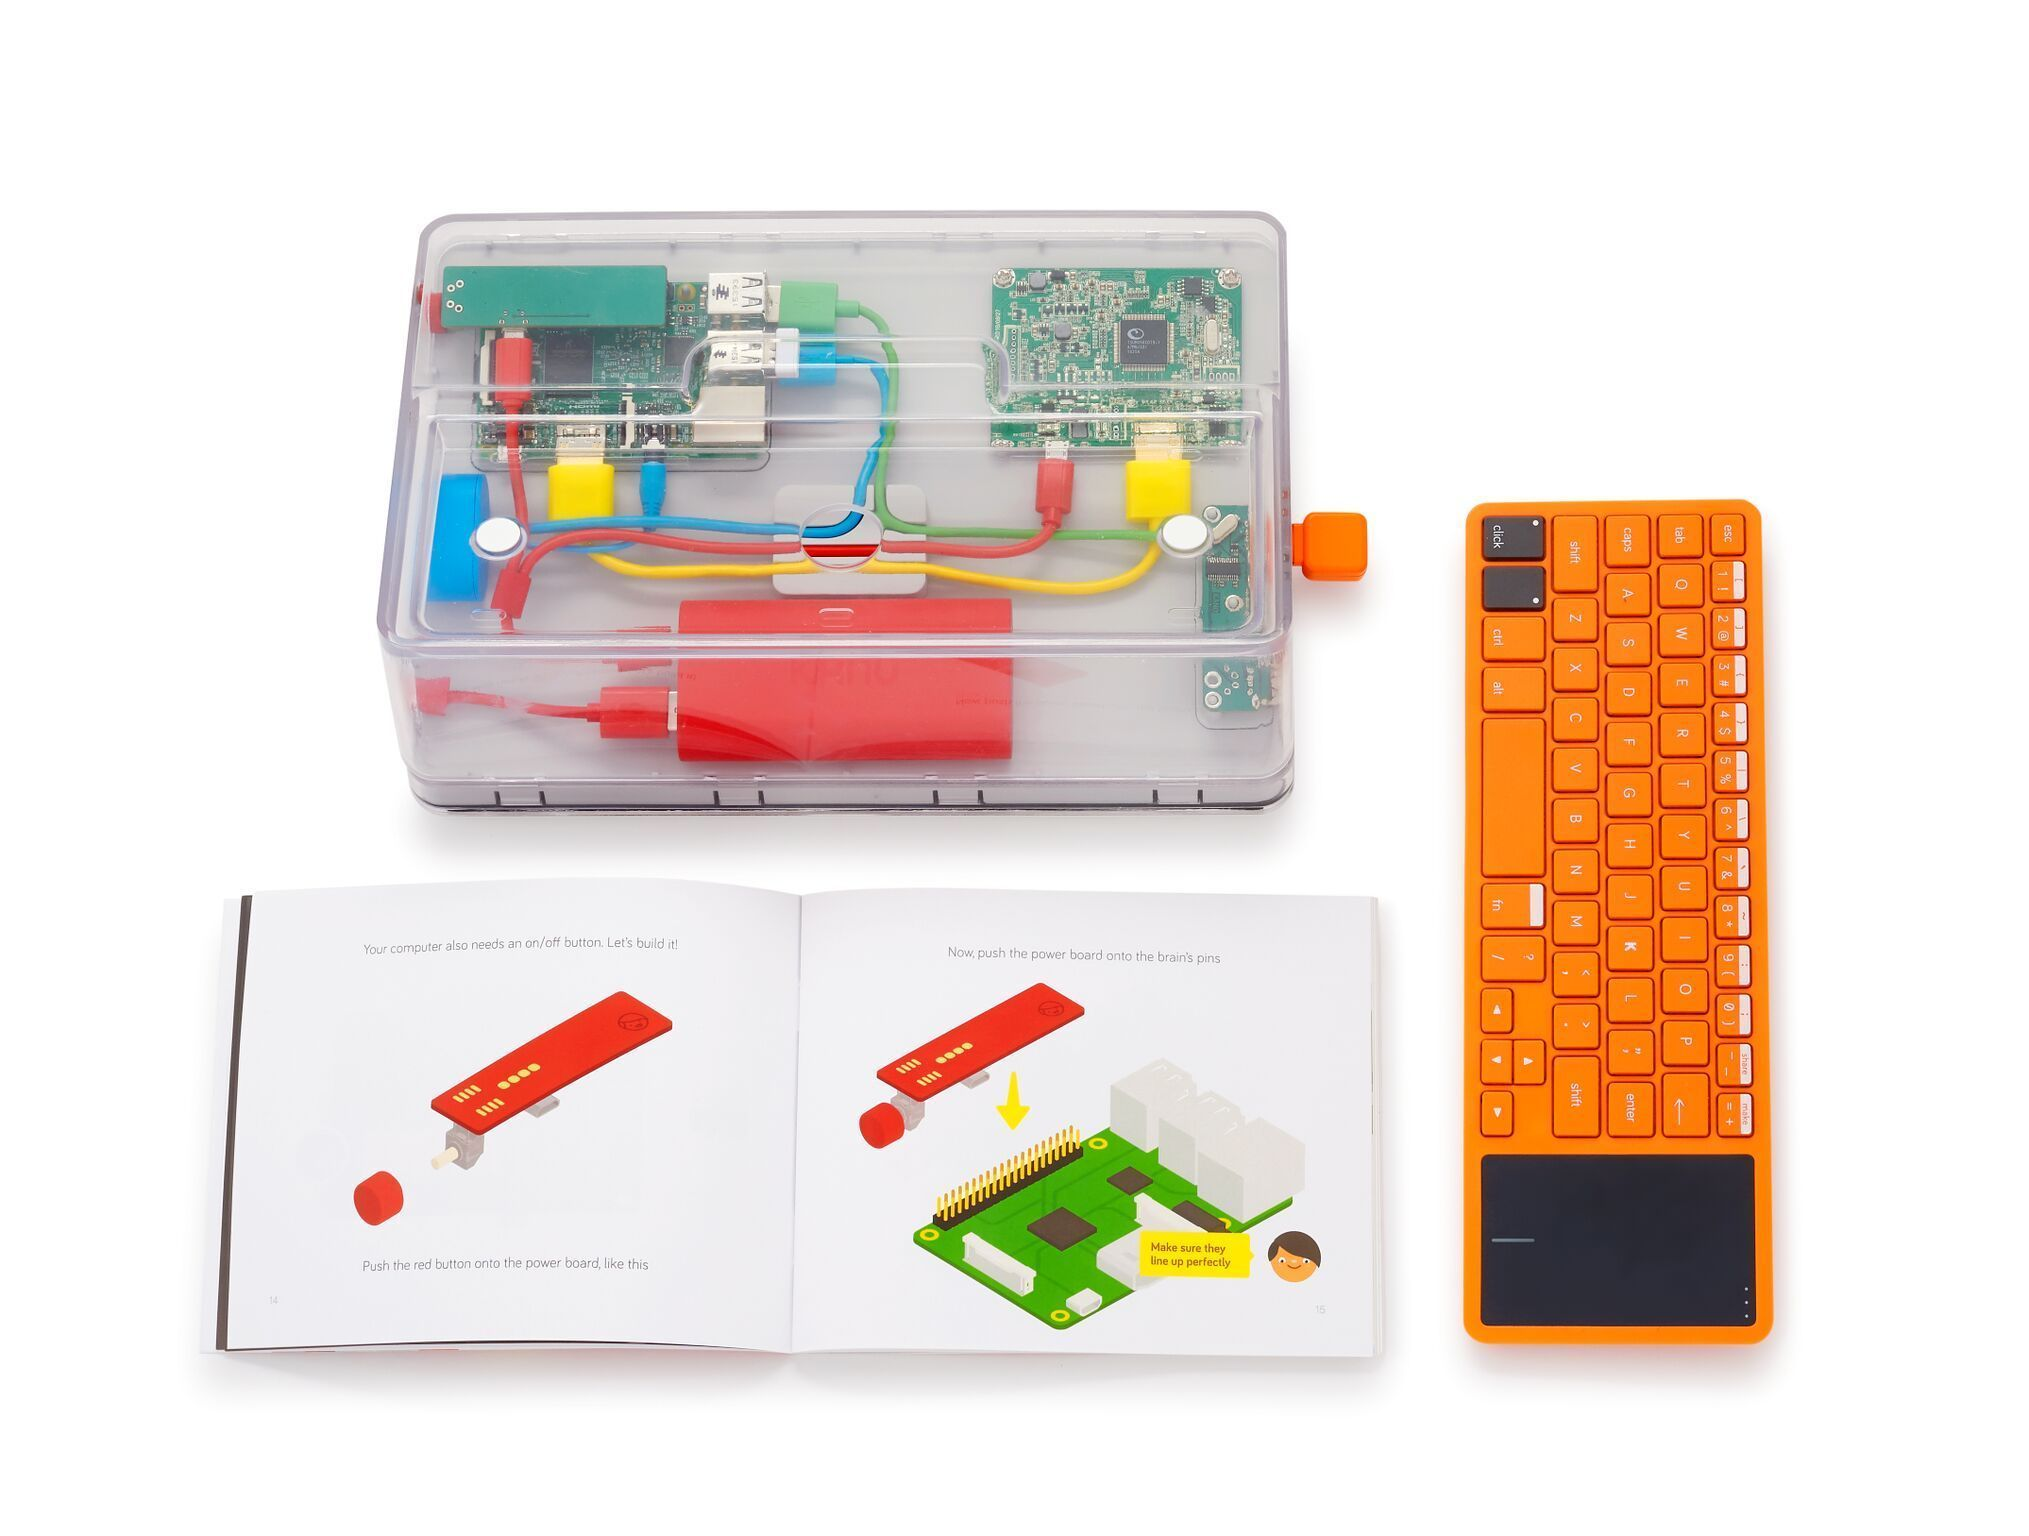 kano computer kit complete review a fun diy laptop that